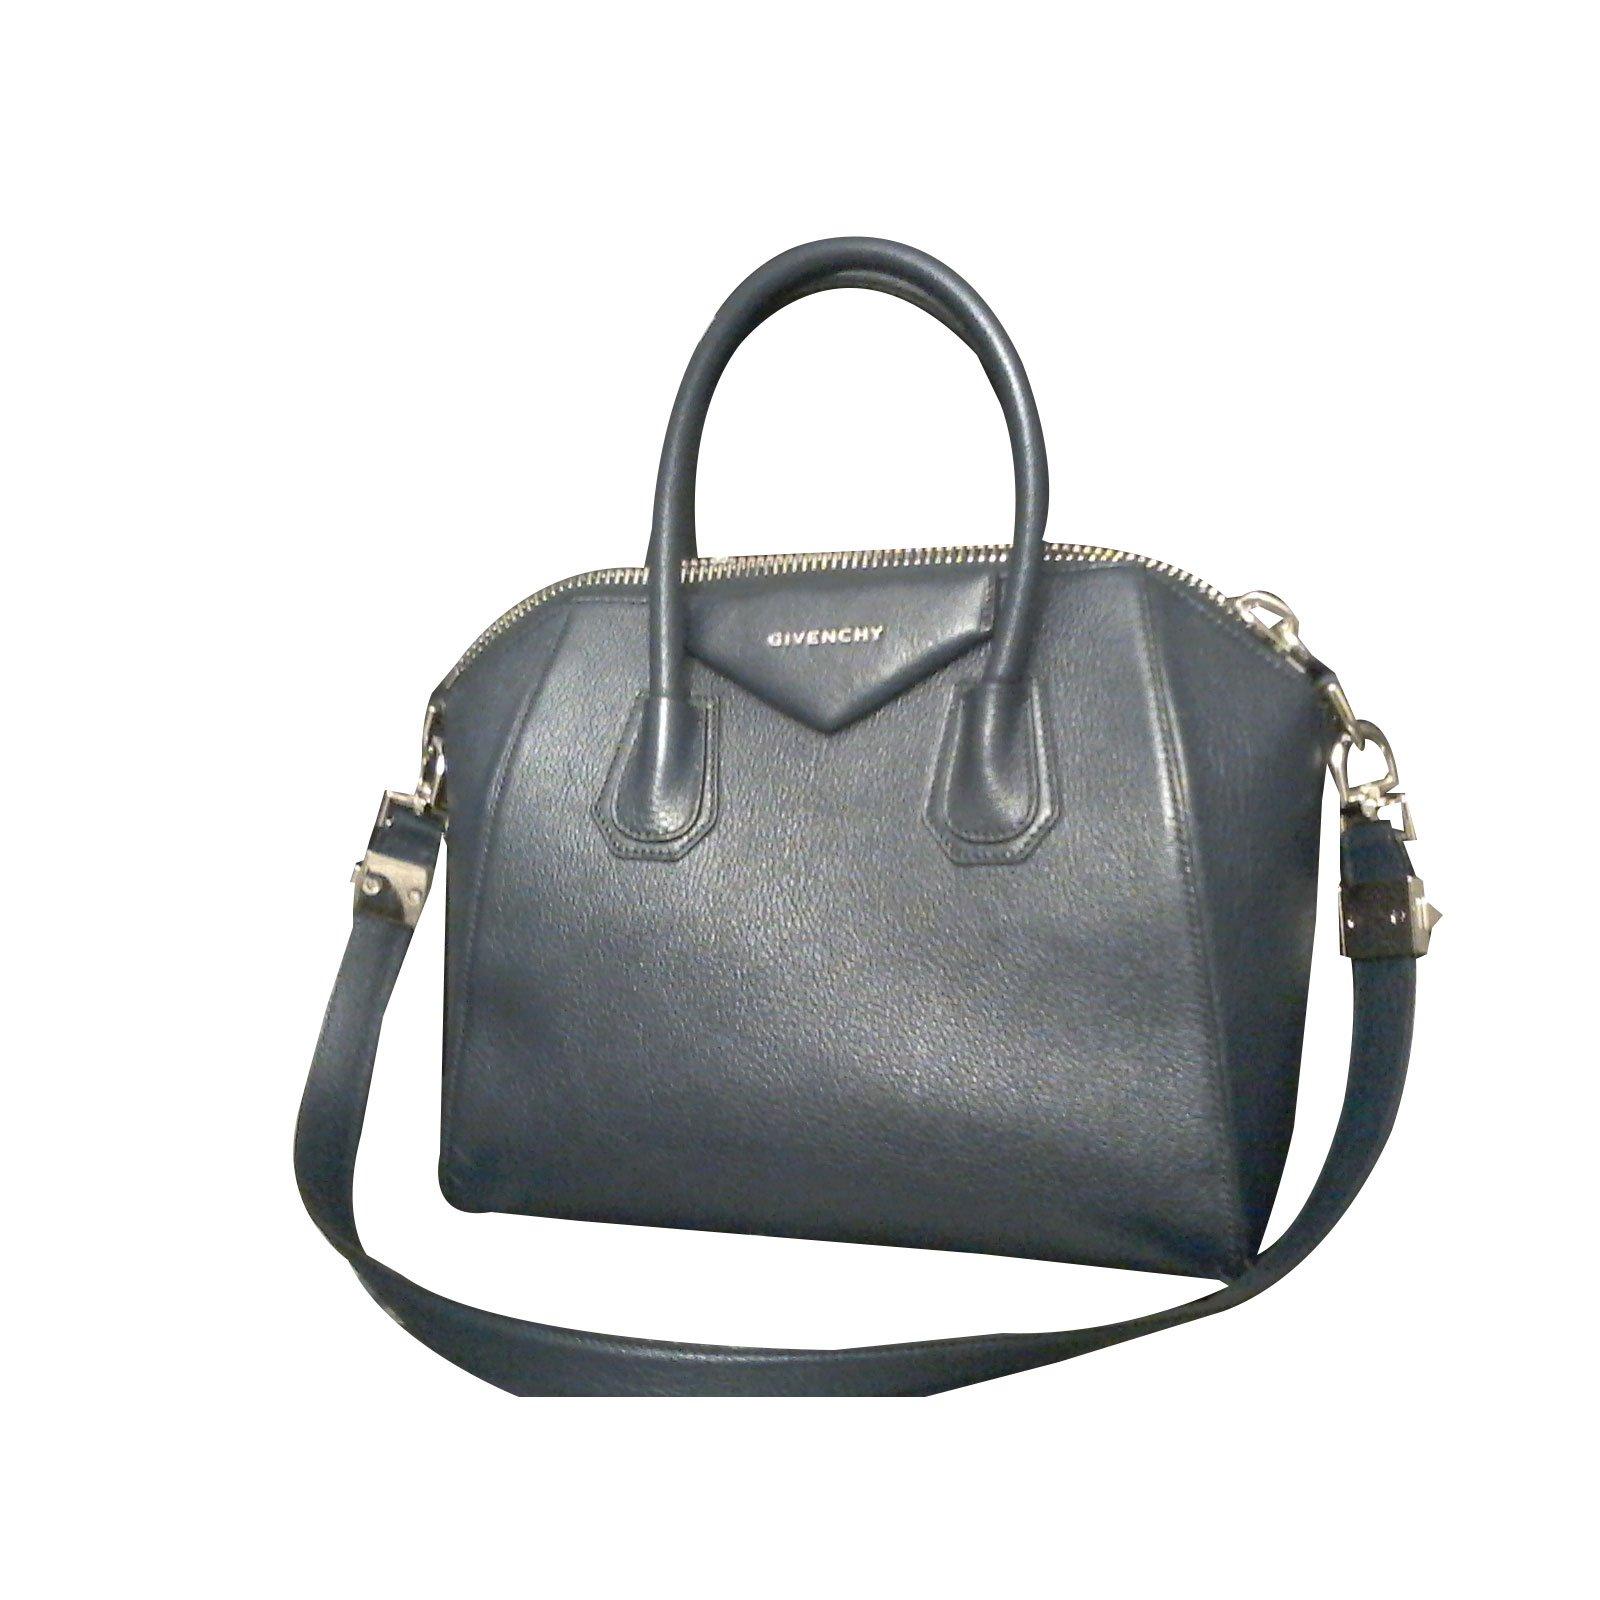 836727f0e0d9 Givenchy Handbag Handbags Leather Navy blue ref.39134 - Joli Closet